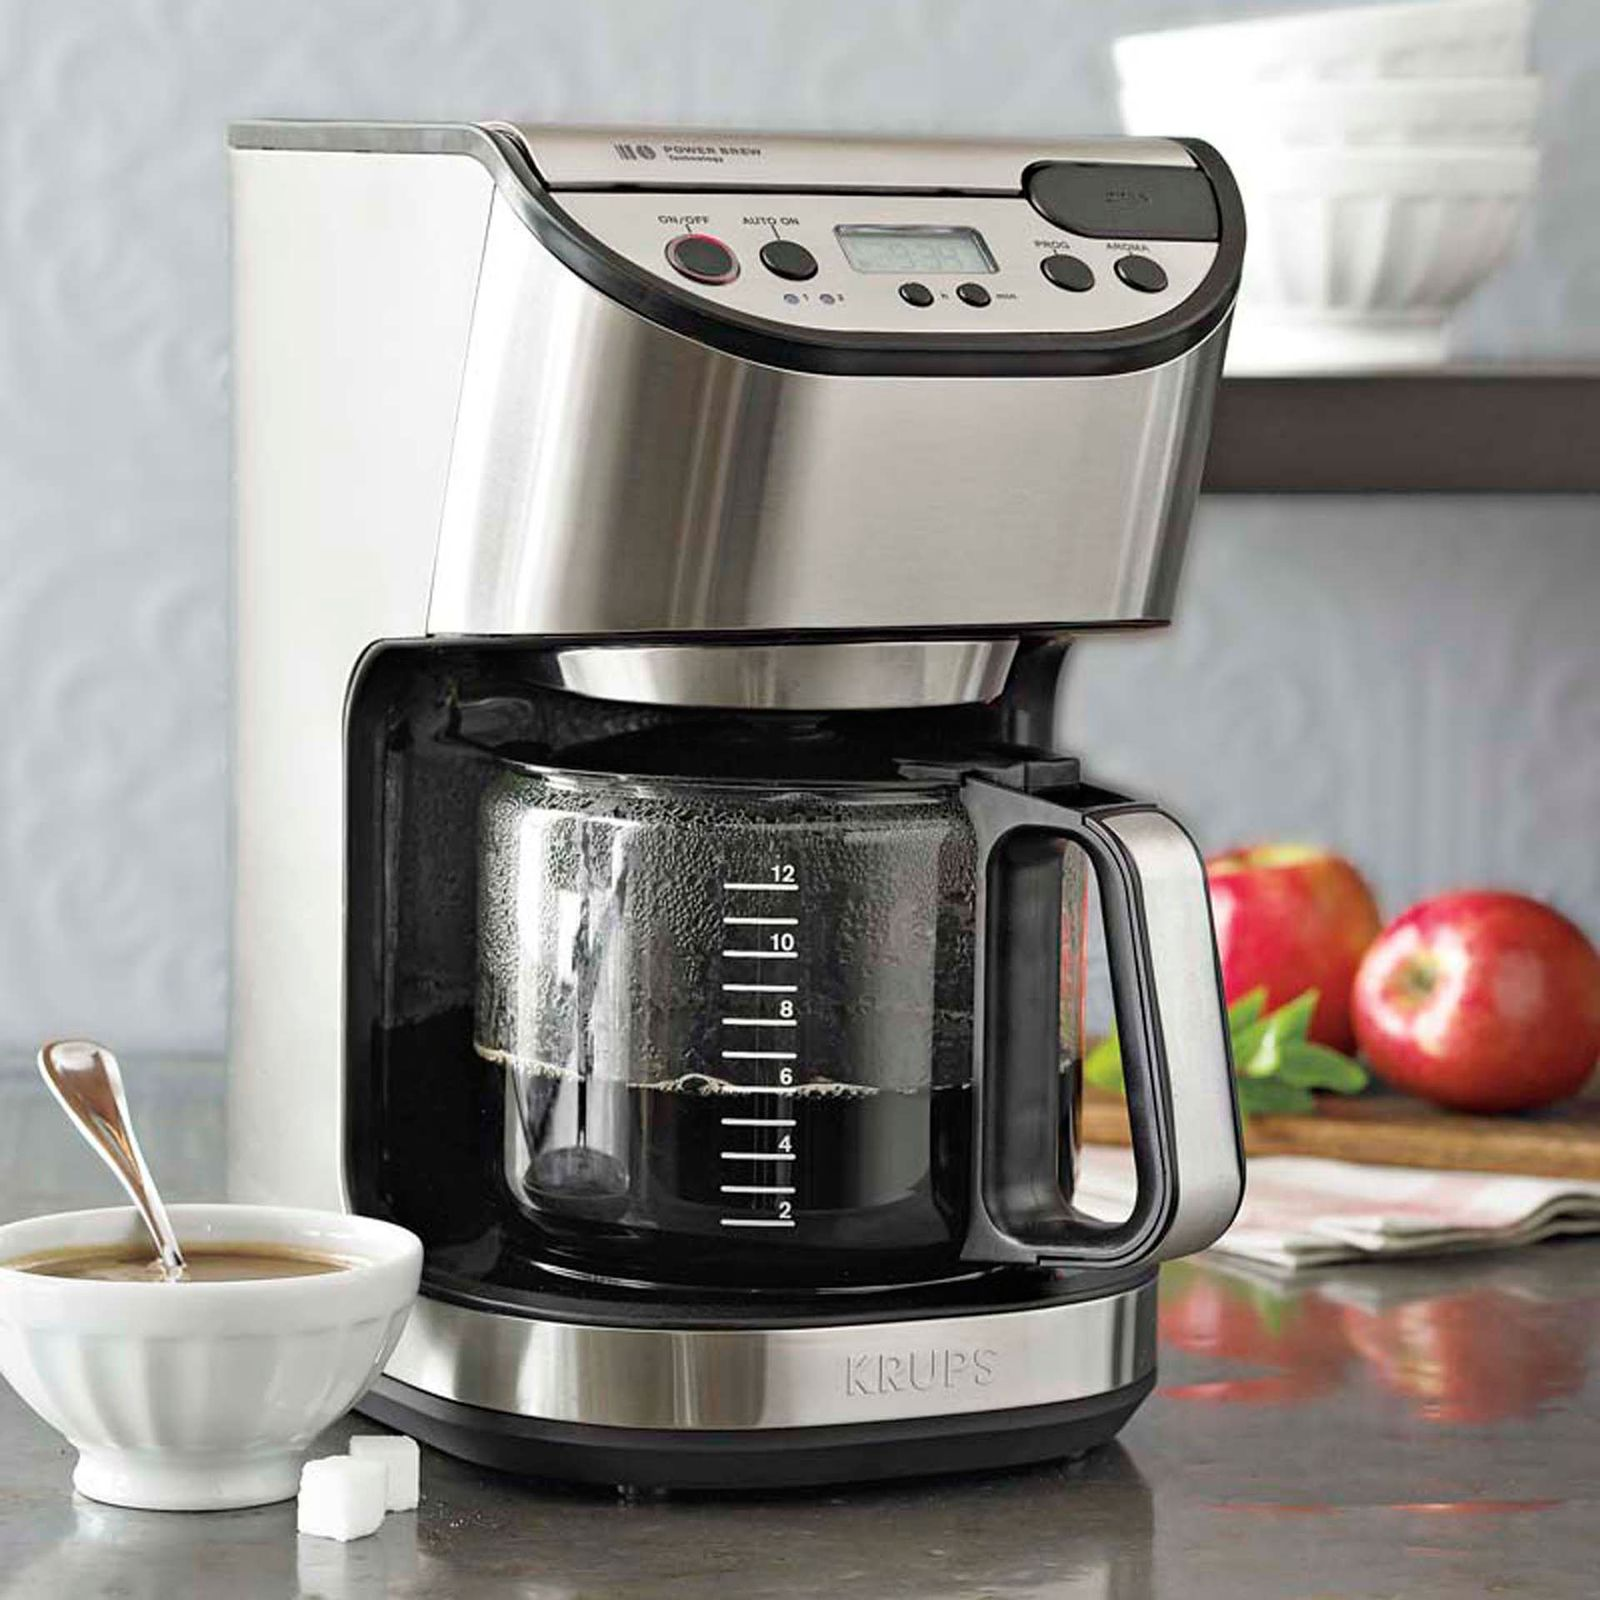 Krups Coffee Maker Xp1600 : 5500943e1940b-ghk-krups-precision-12-cup-coffeemaker-s2.jpg